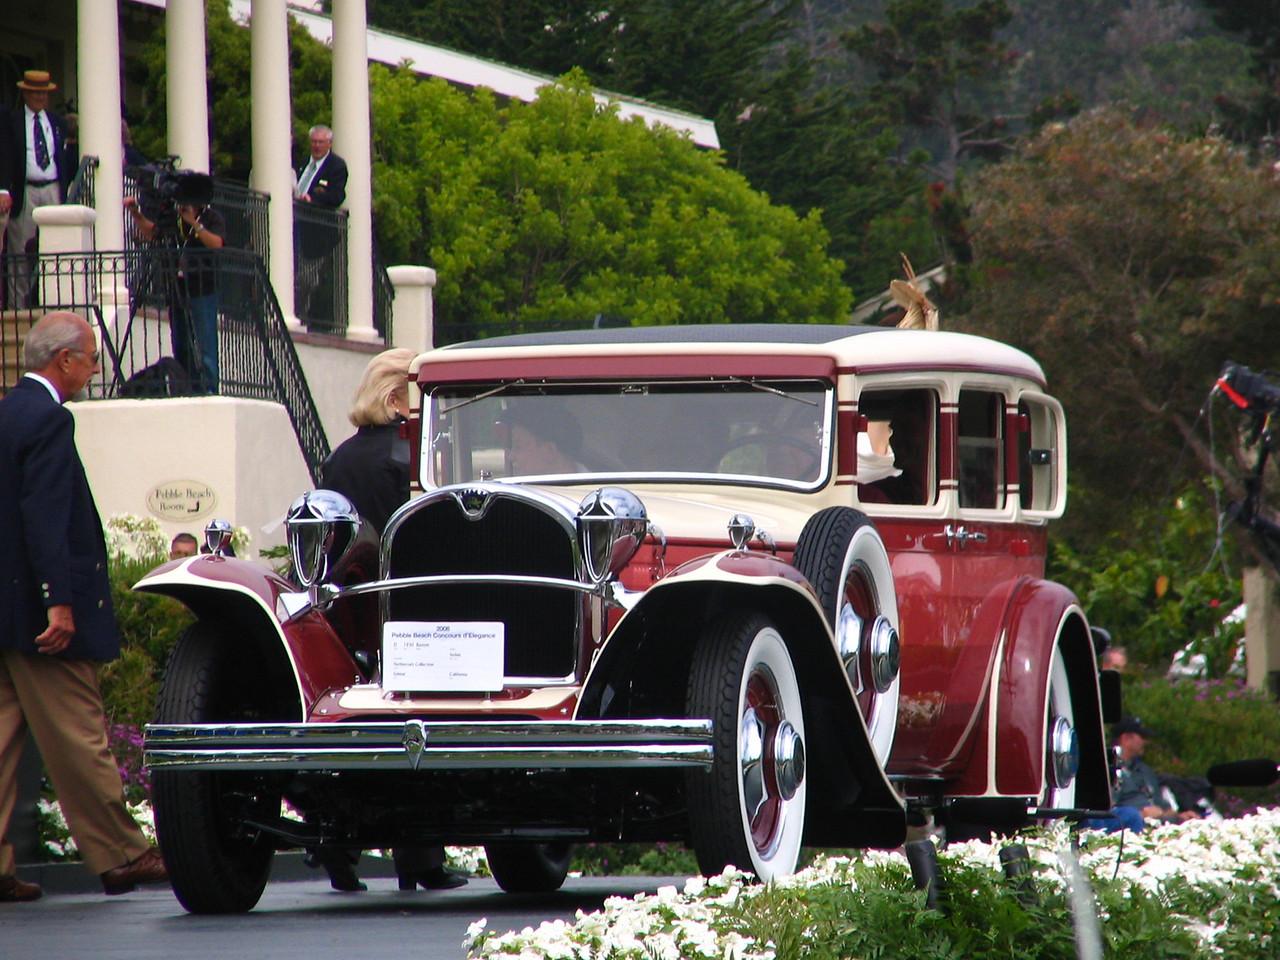 Class D, American Classic Closed 1925-1941, Winner and Classic Car Club of America Trophy winner -- 1930 Ruxton Sedan